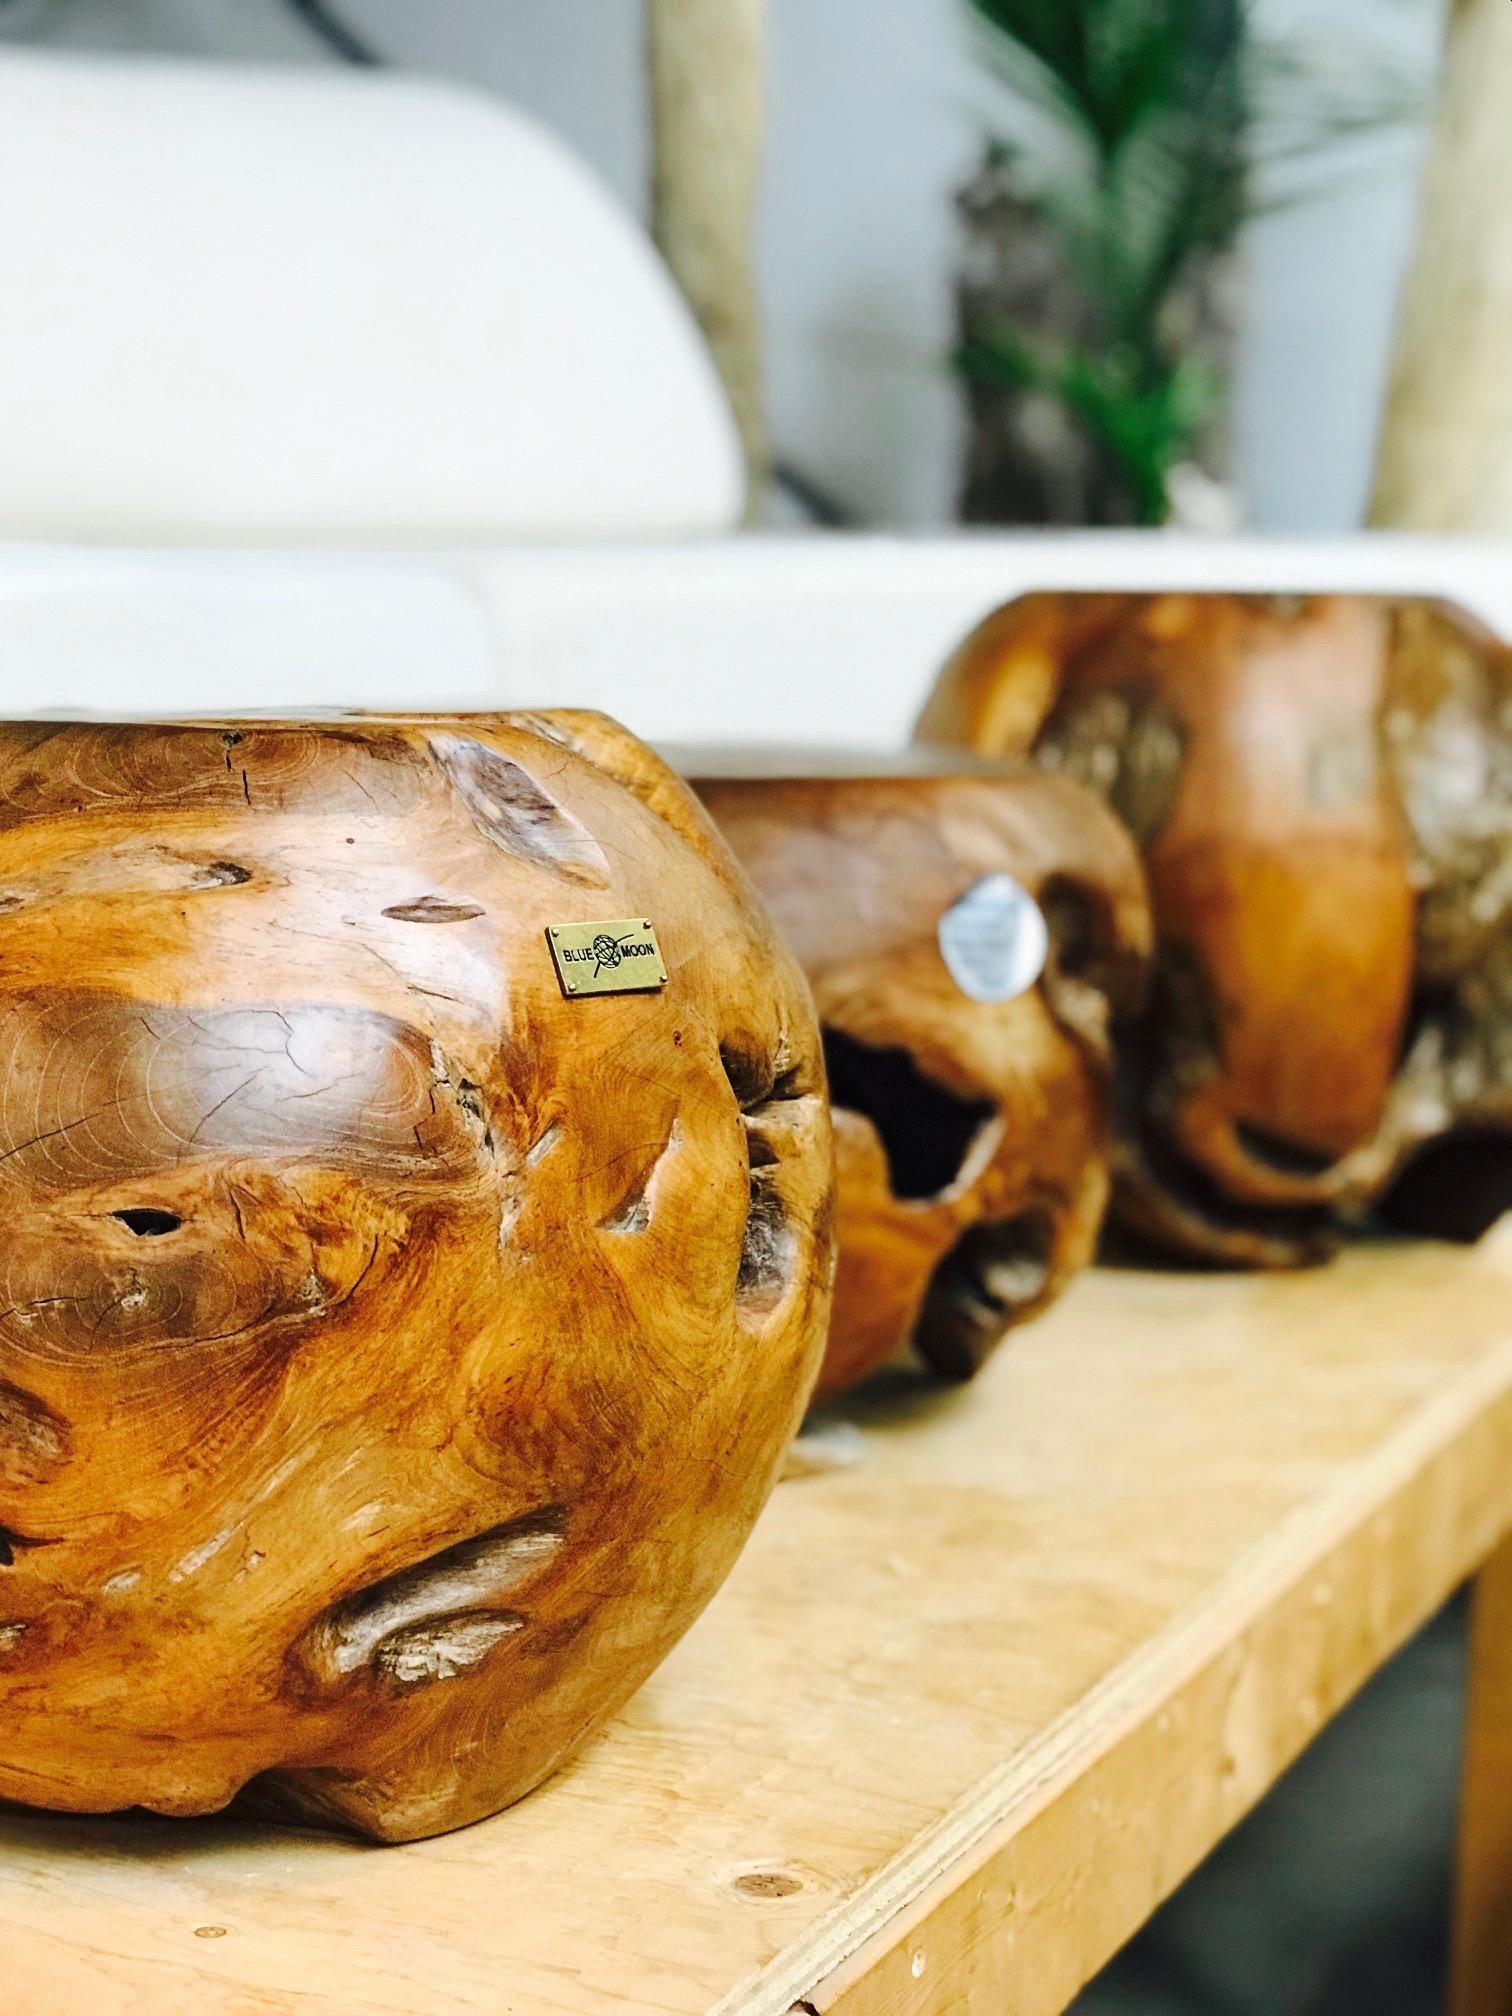 teak root balls. Home decor and furniture. Blue Moon furniture store in winnipeg.jpg